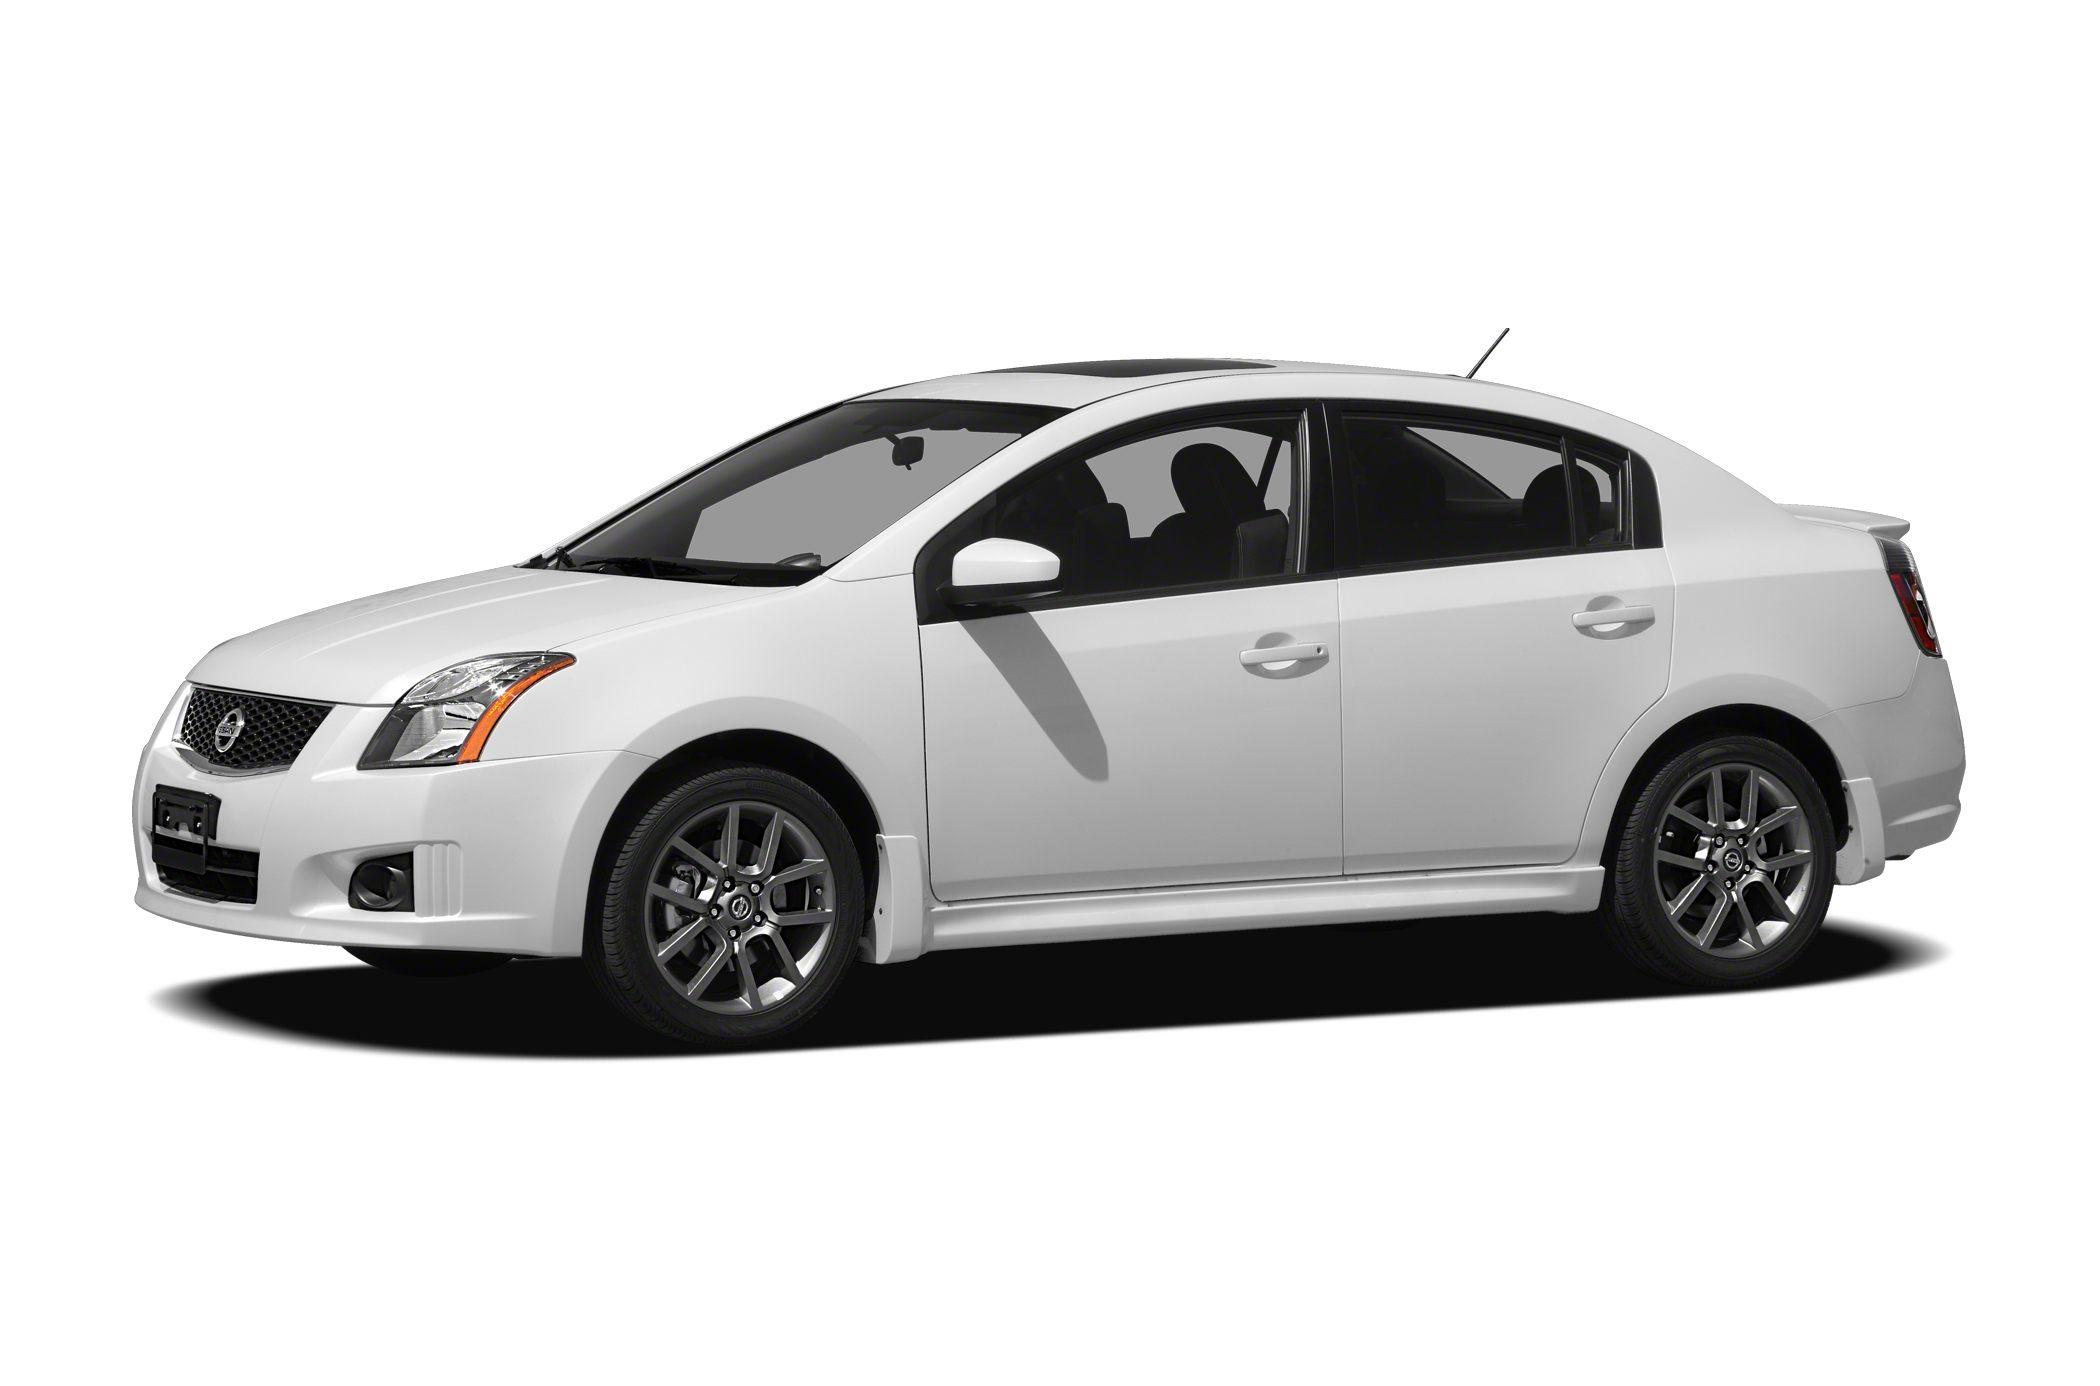 2010 Nissan Sentra Se R 4dr Sedan Specs And Prices